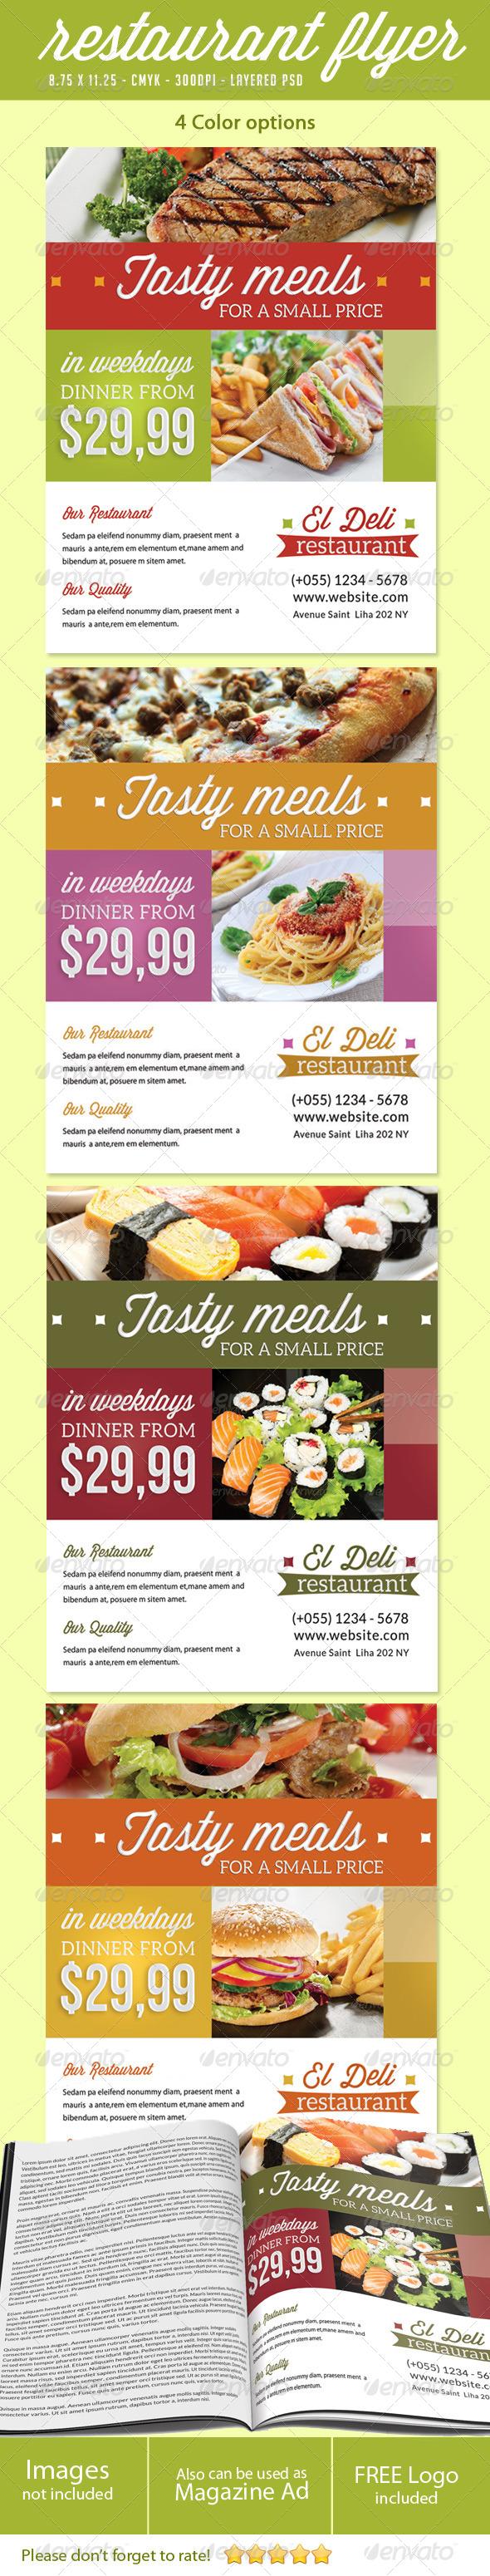 Restaurant Flyer Print Ad